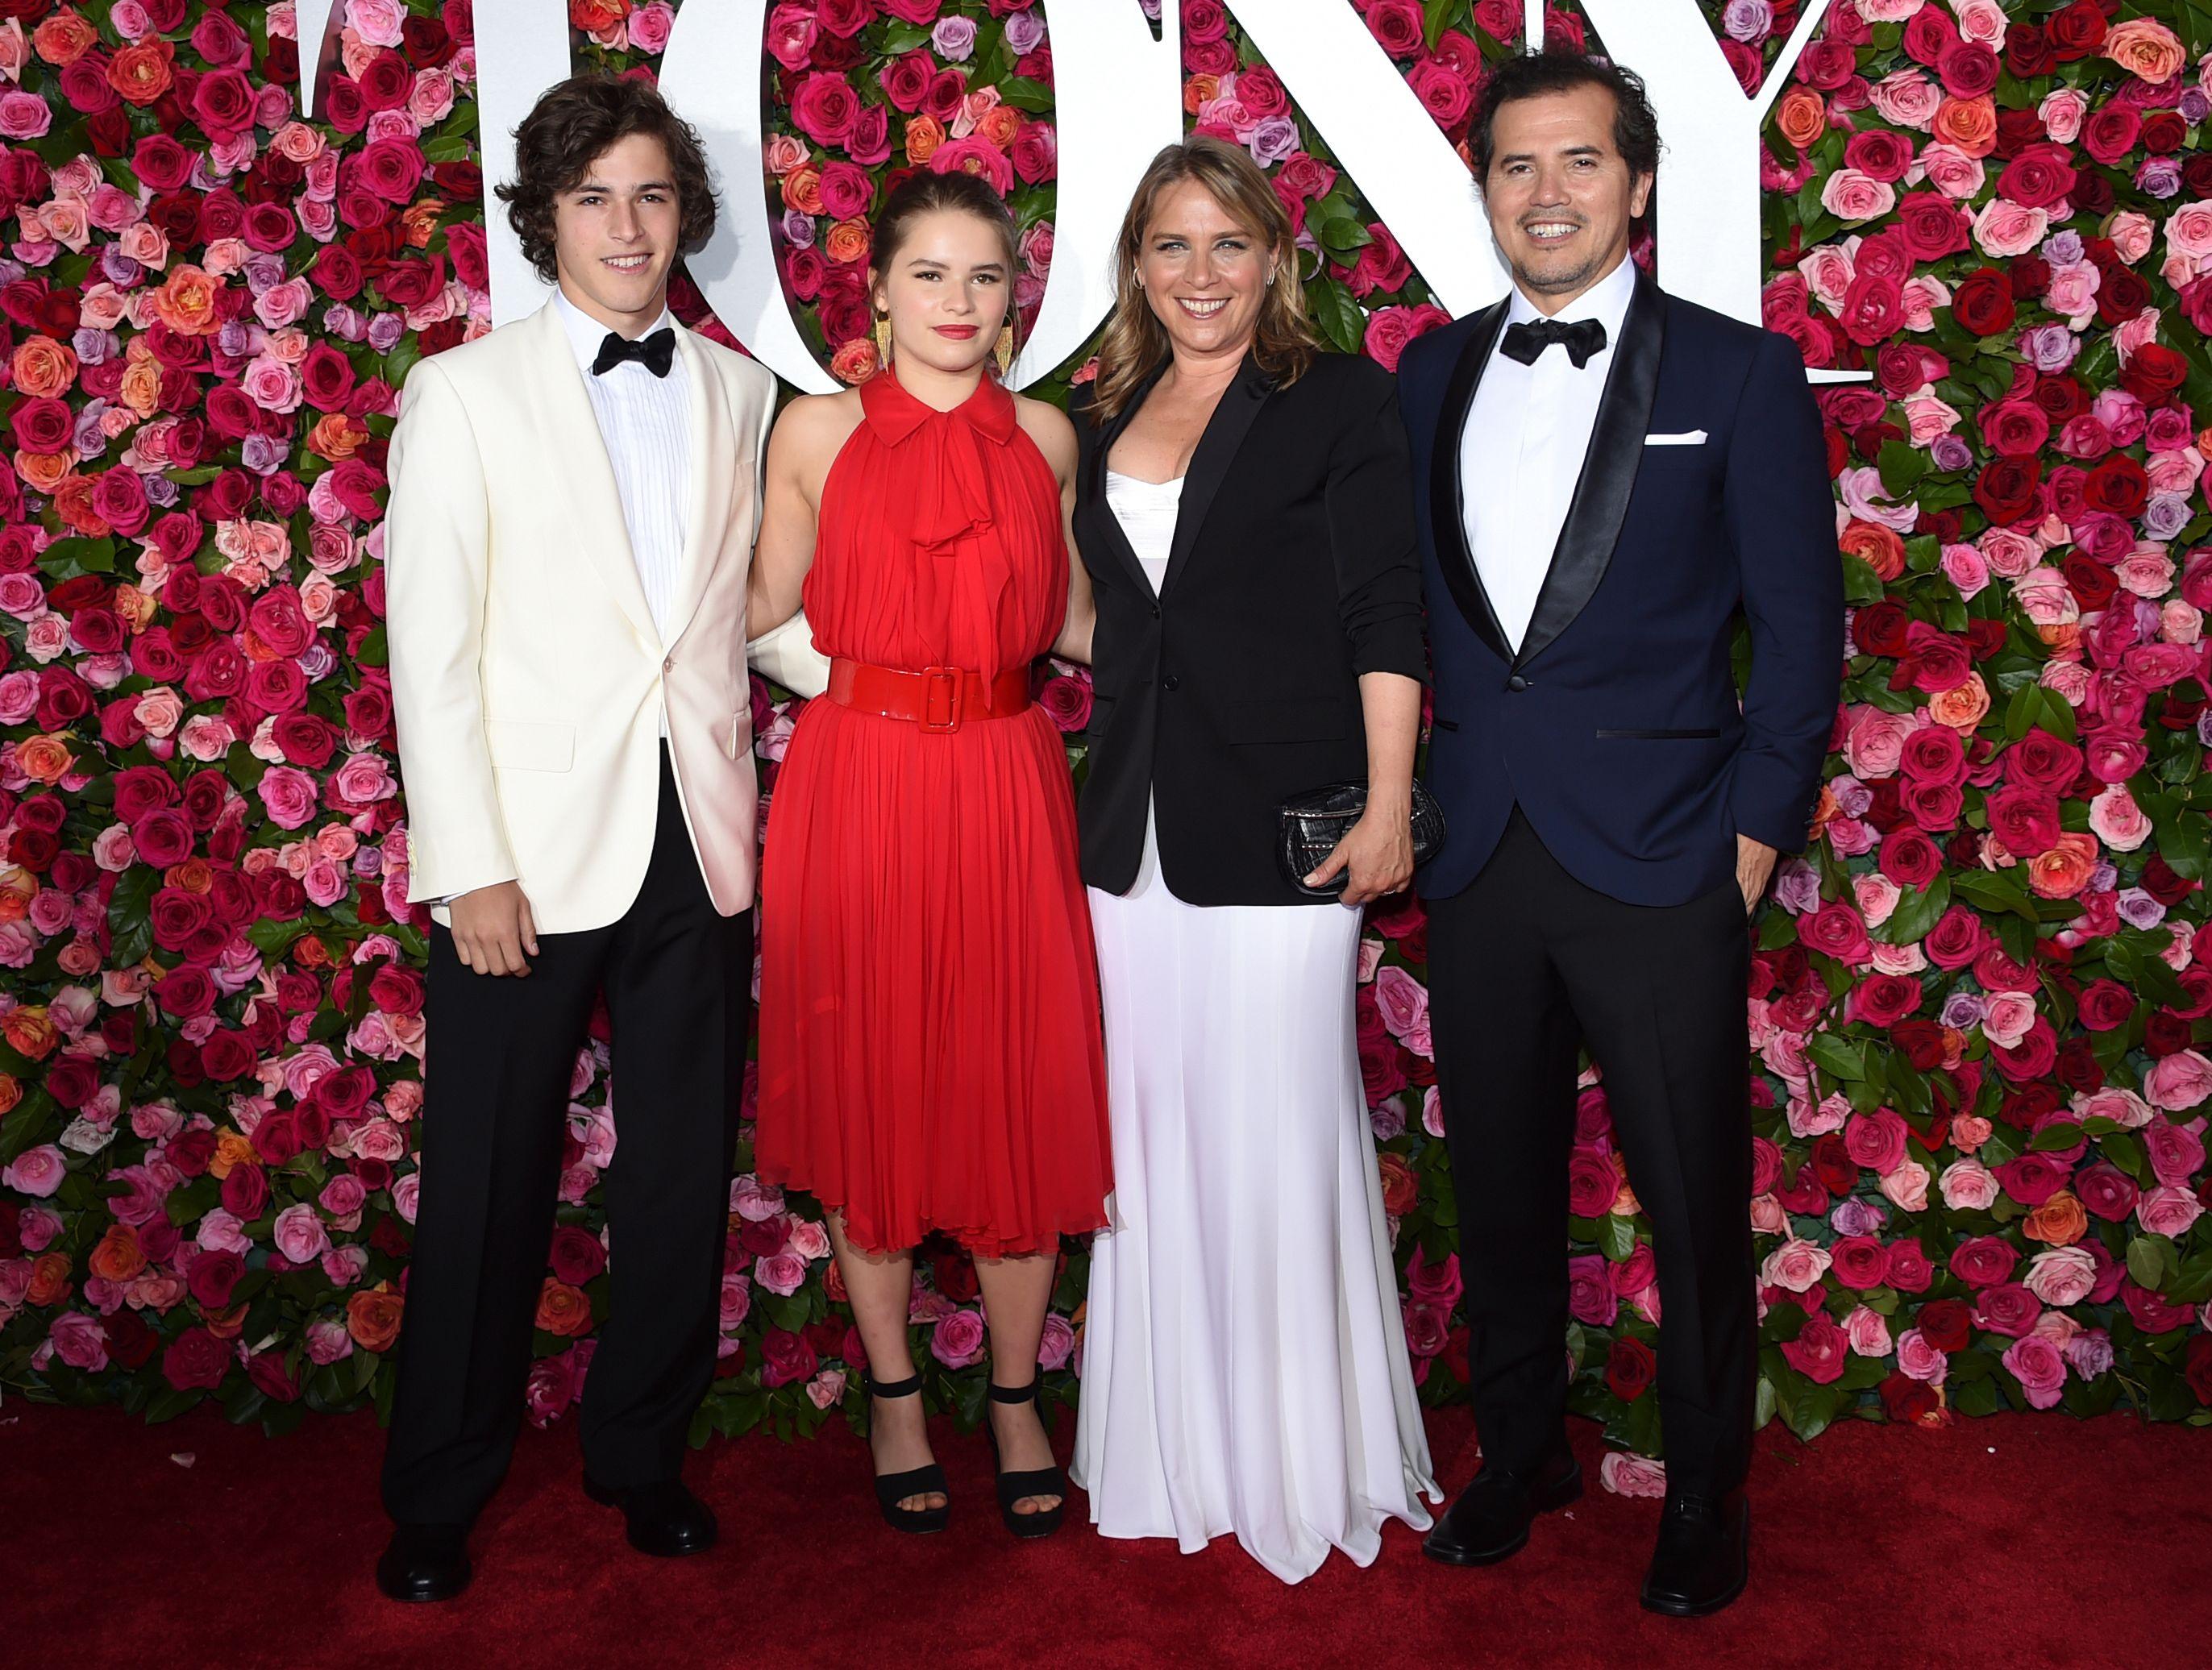 Lucas Leguizamo, from left, Allegra Leguizamo, Justine Maurer and John Leguizamo arrive at the 72nd annual Tony Awards